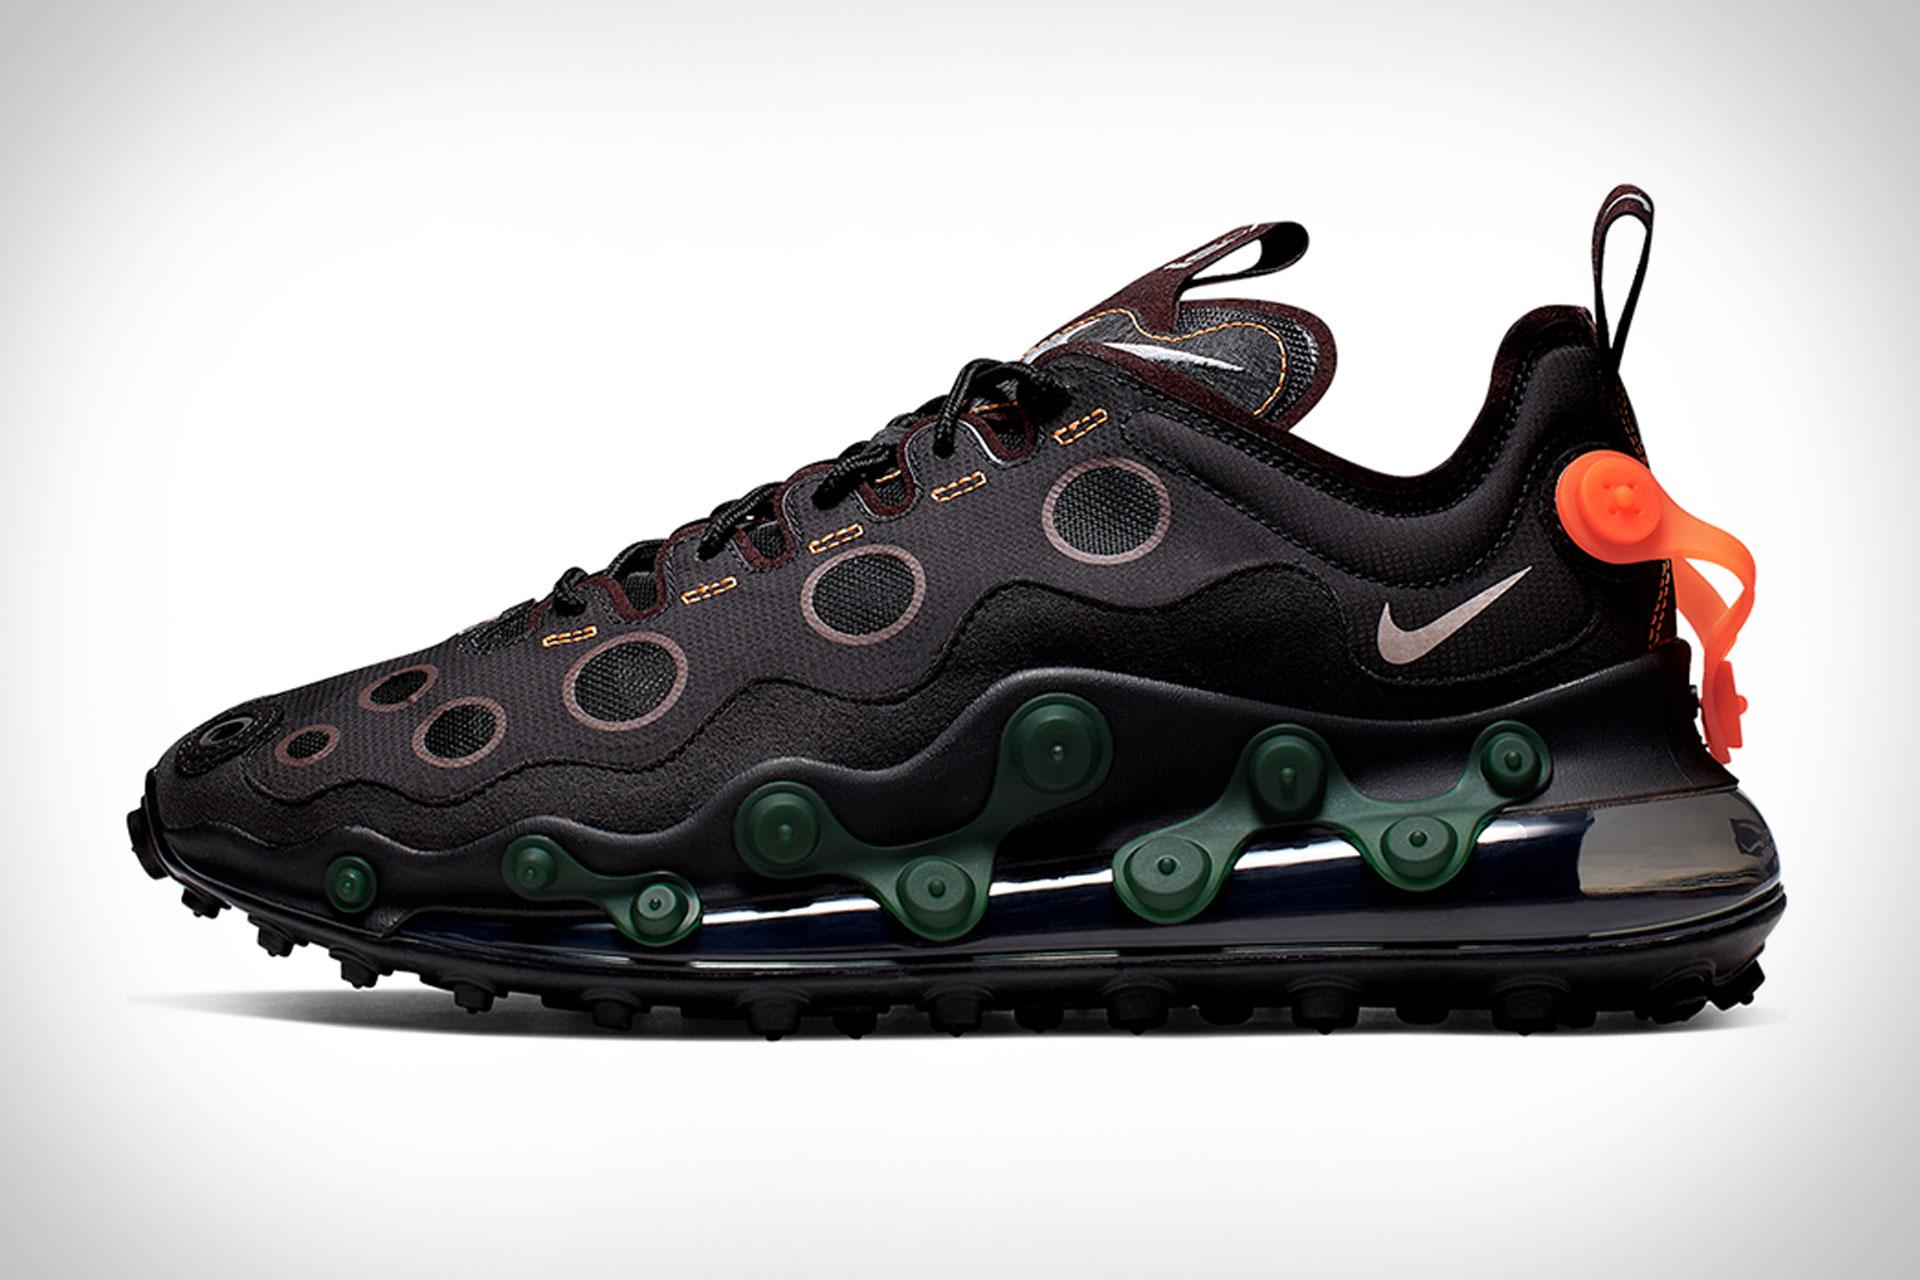 Zapatillas Nike Air Max 720 ISPA | Uncrate